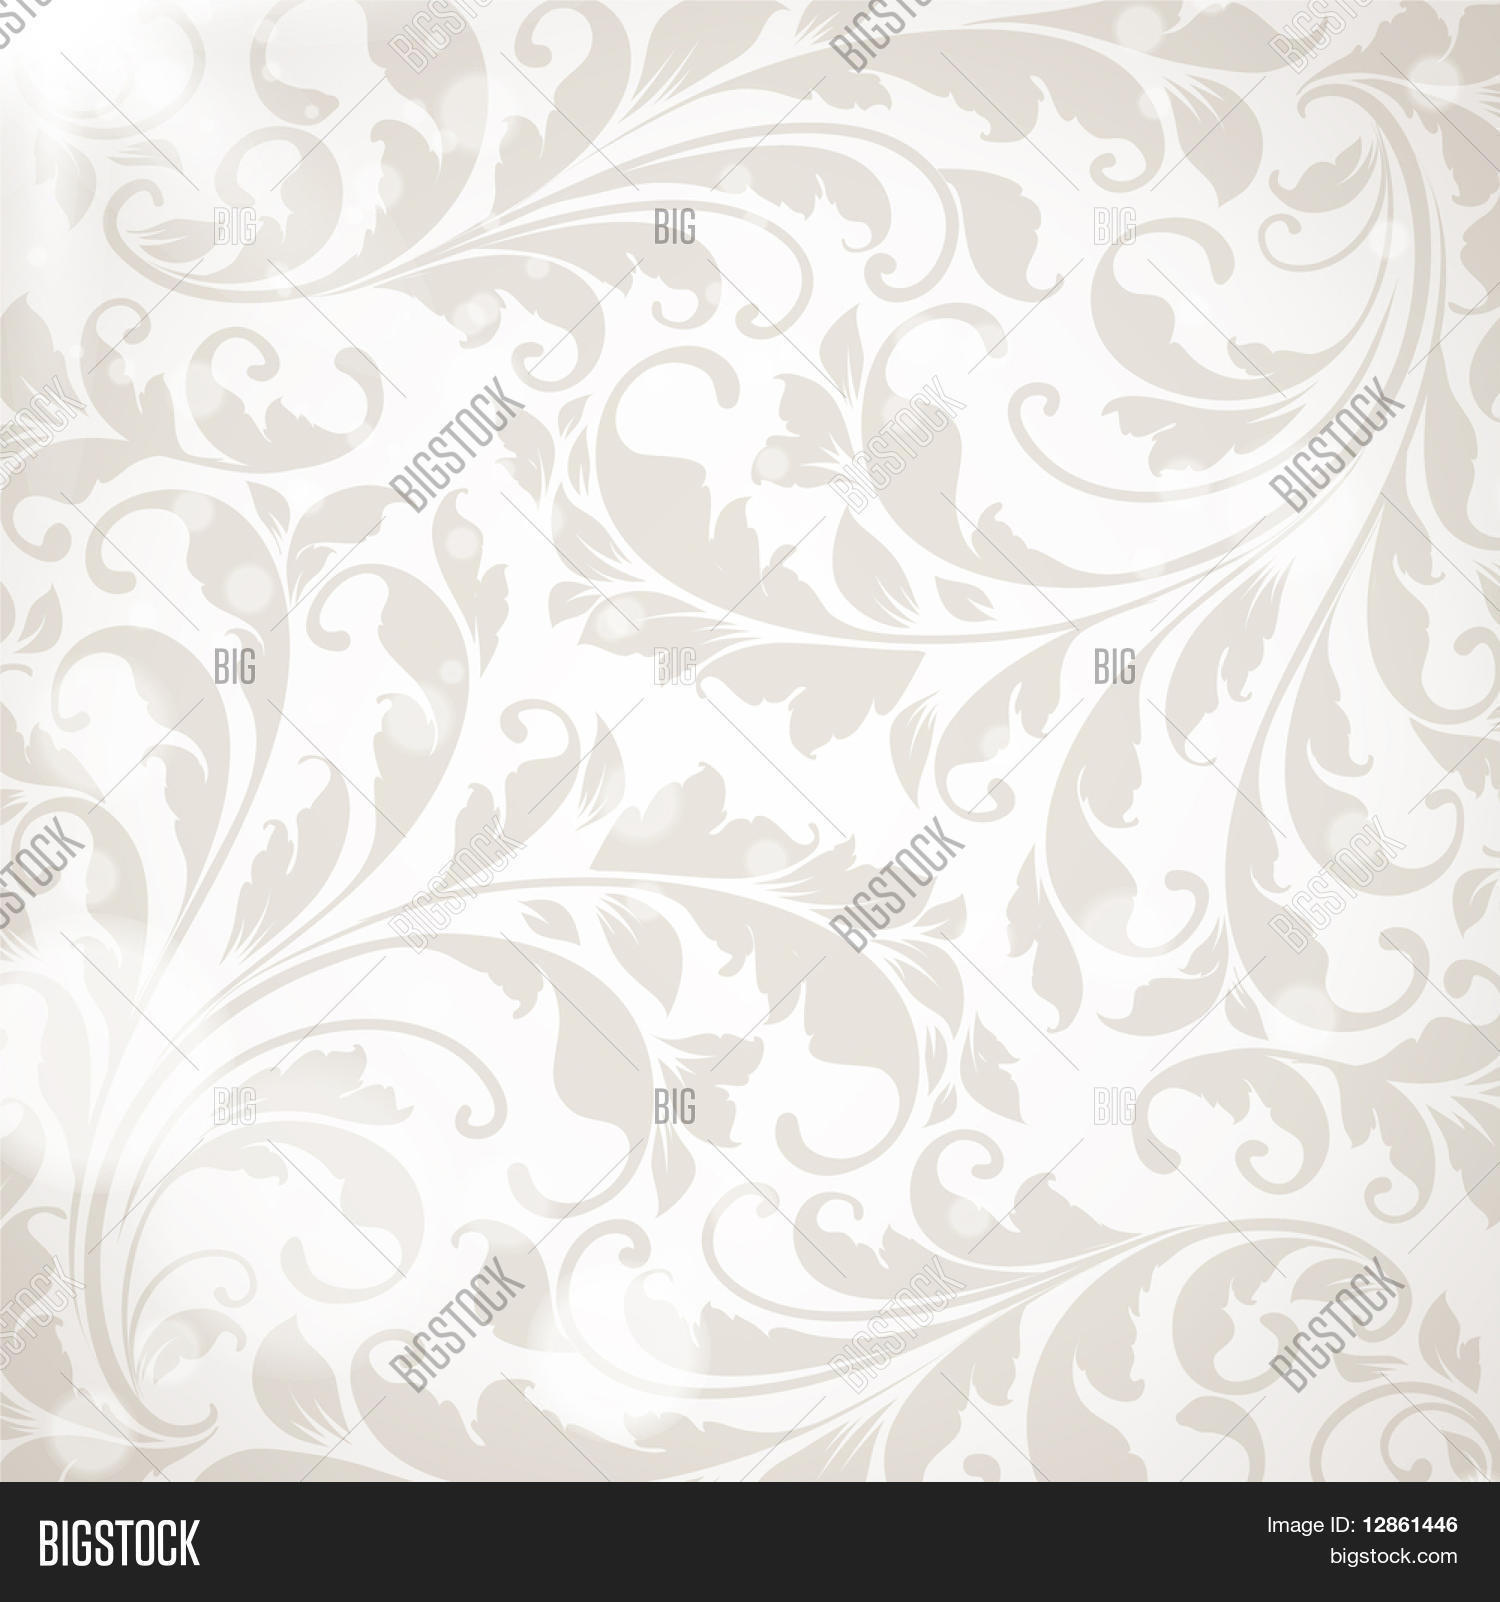 Wallpaper Floral Vector Photo Free Trial Bigstock